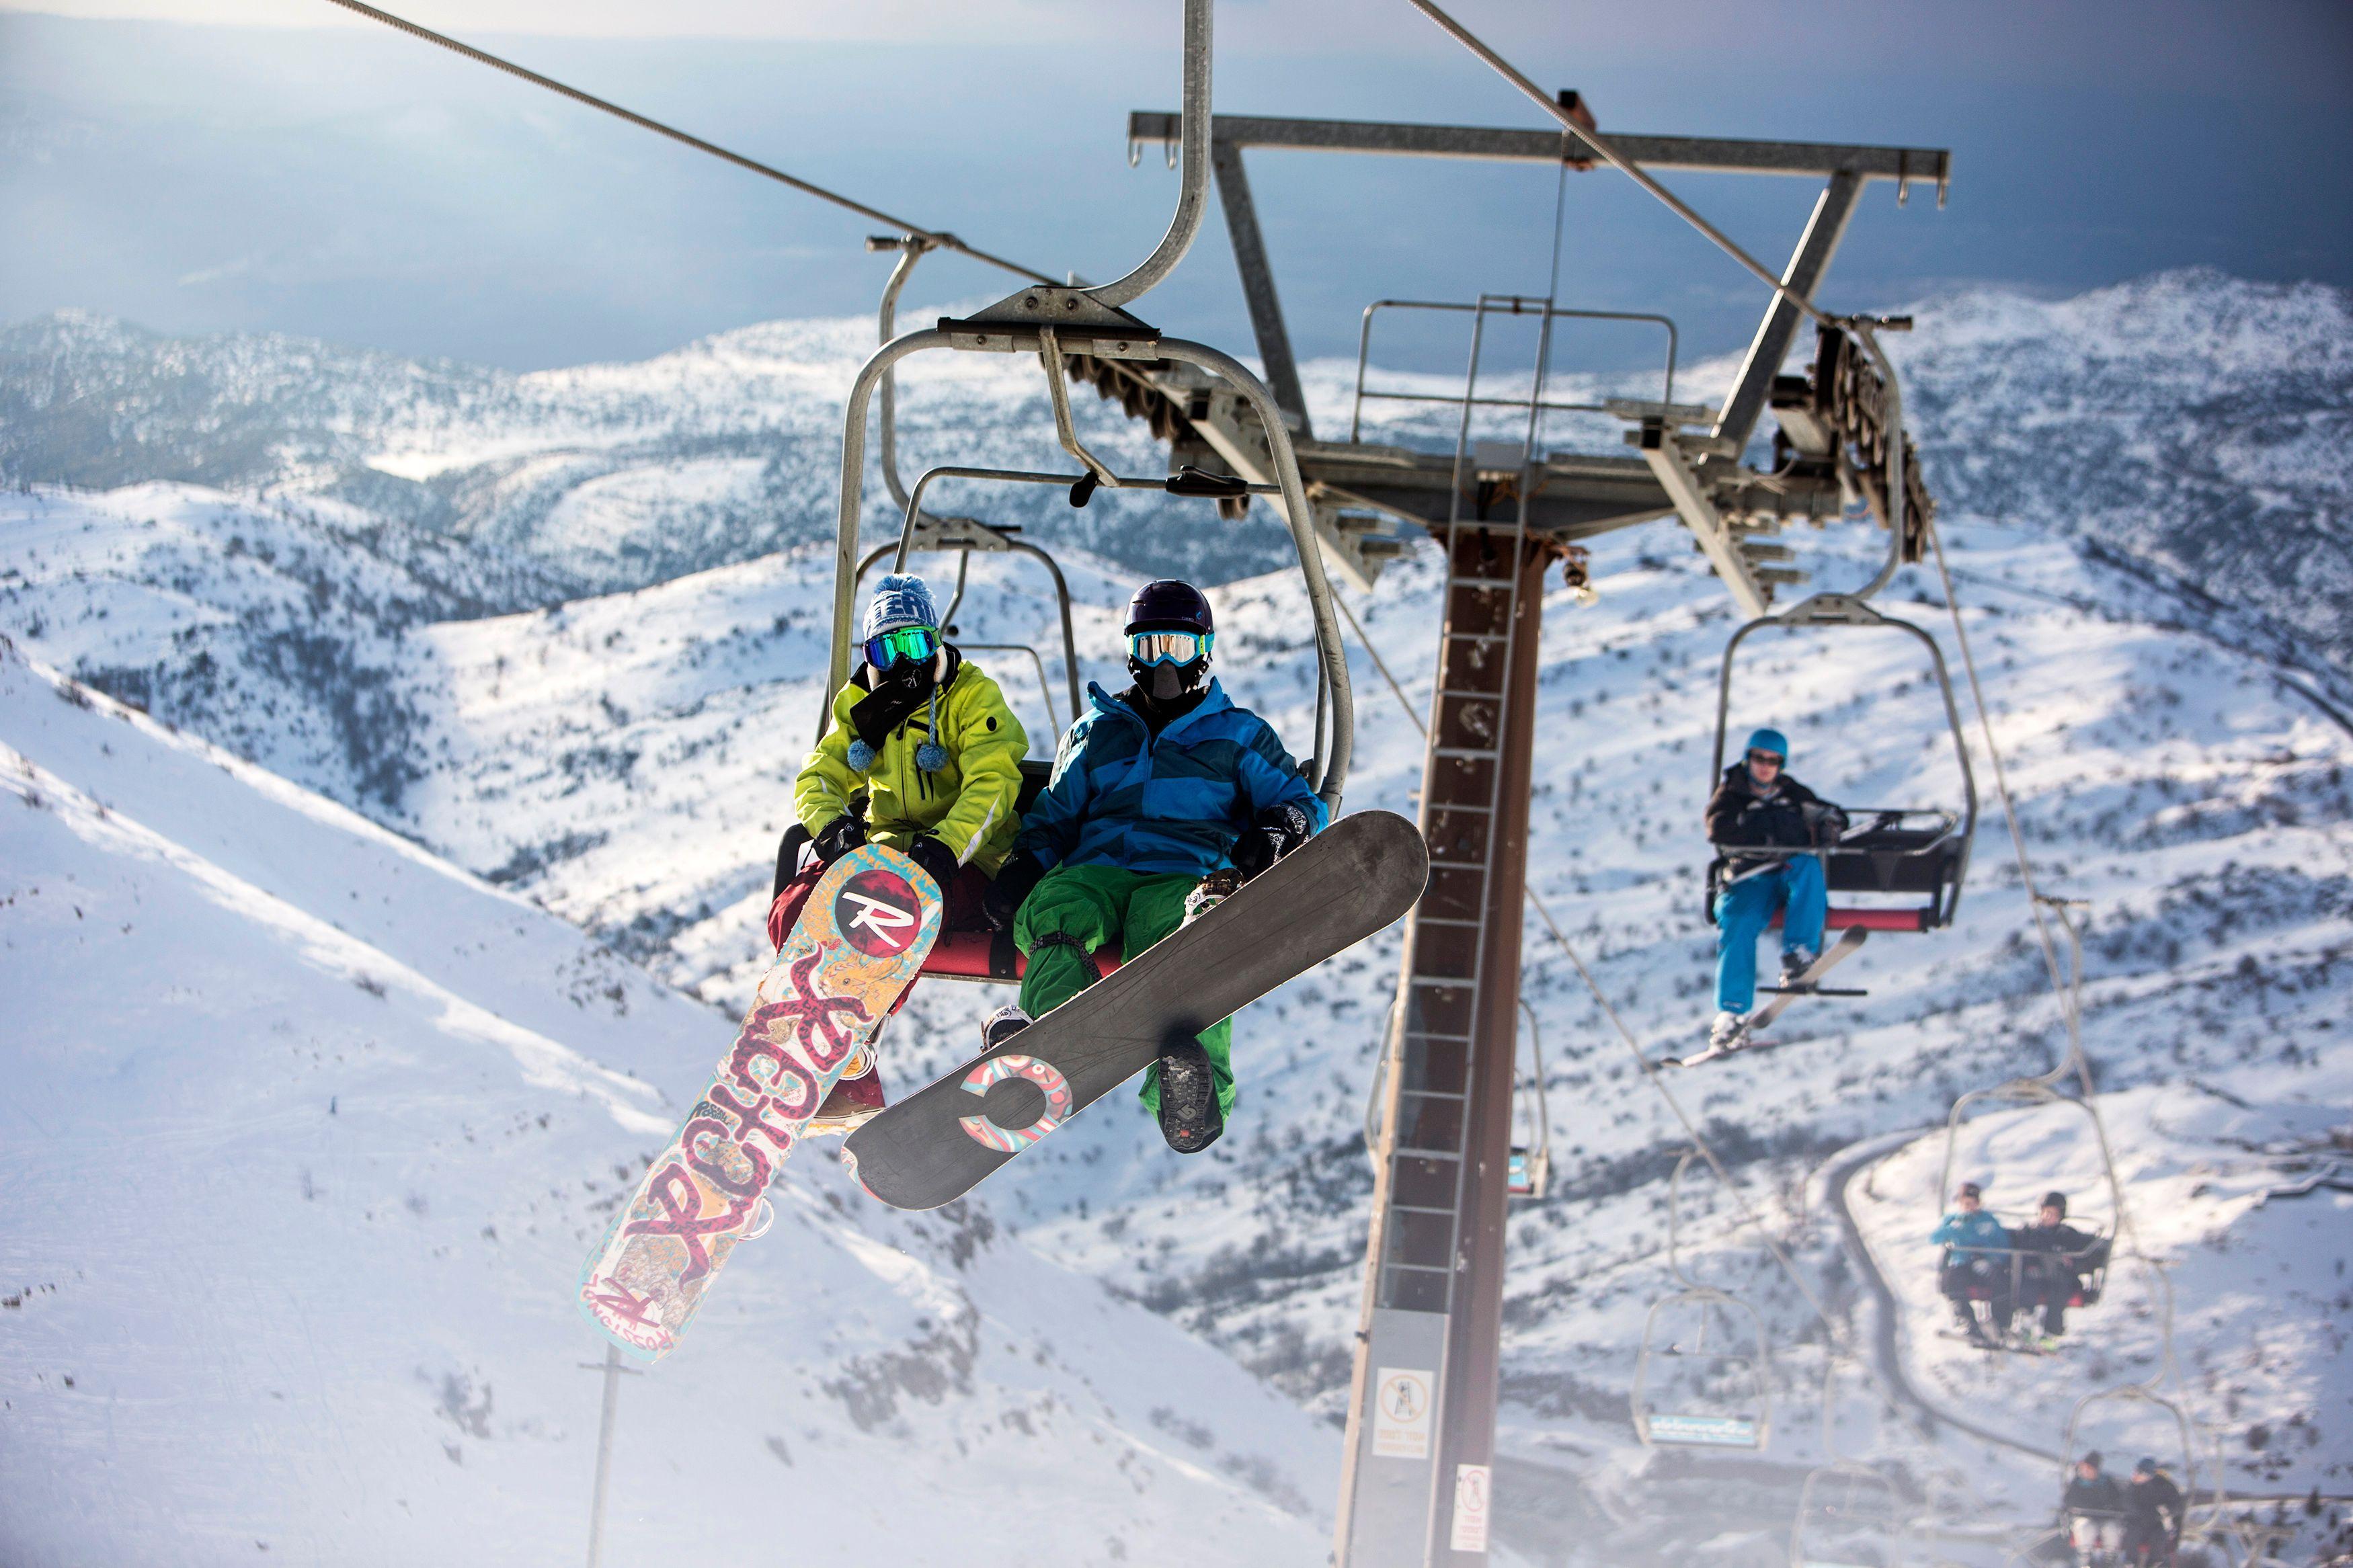 Boire ou skier, il faut choisir.